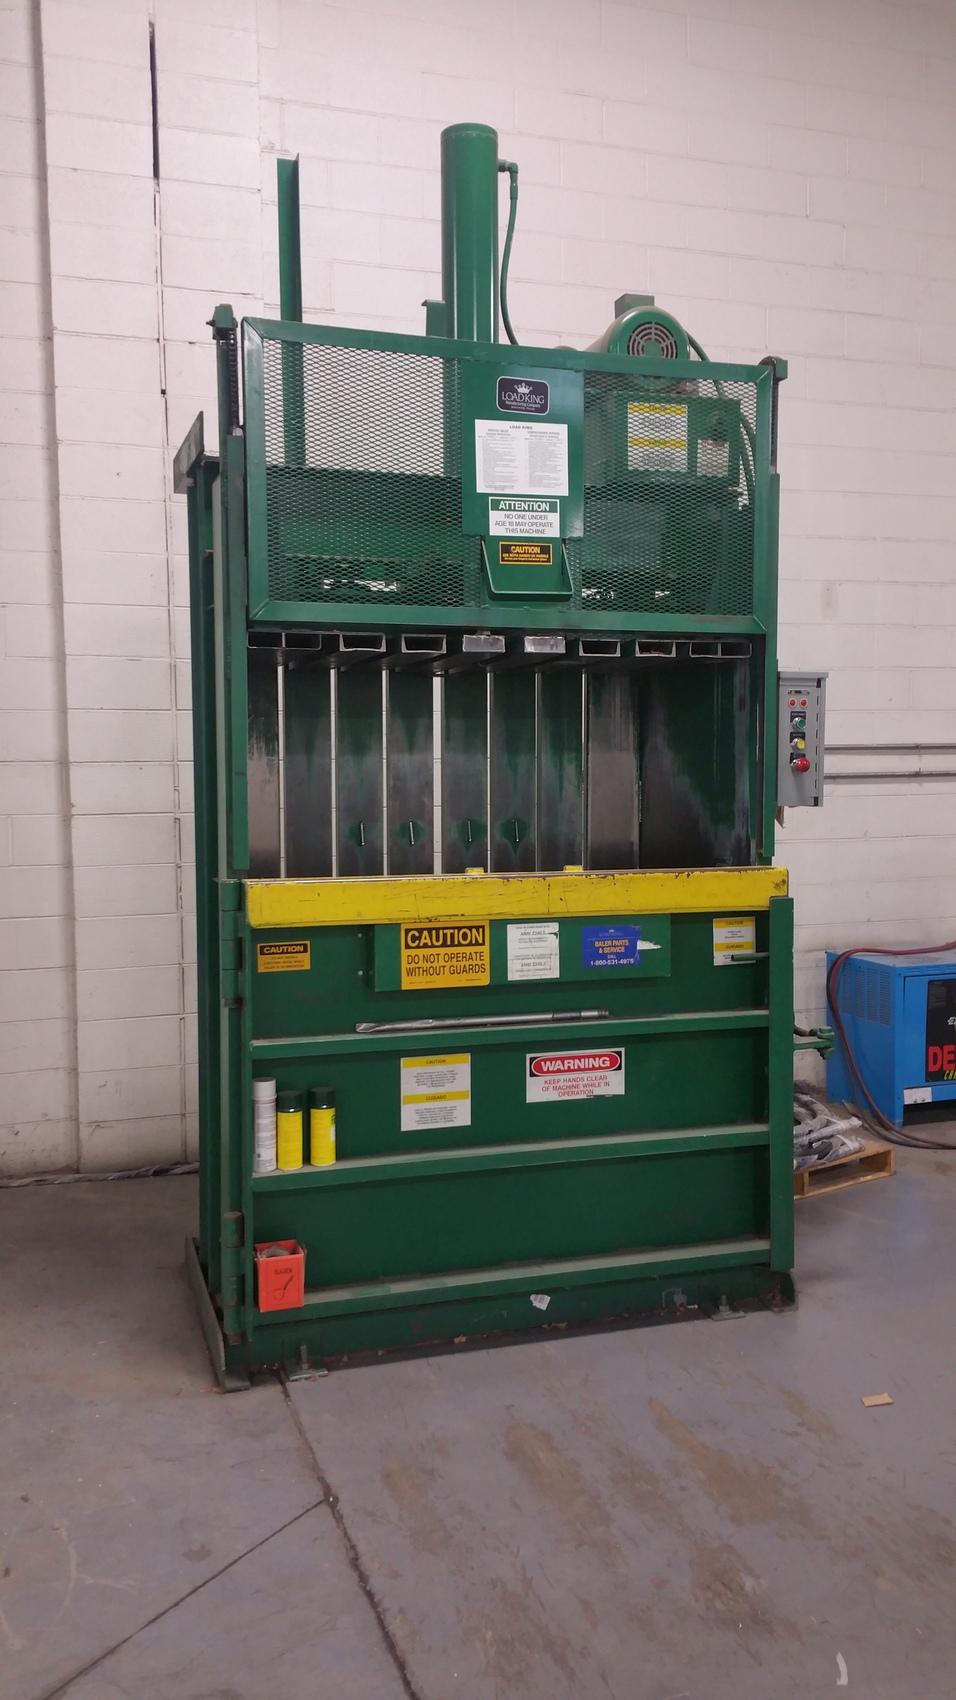 Cardboard Baling Wire : Load king vertical cardboard trash baler plus